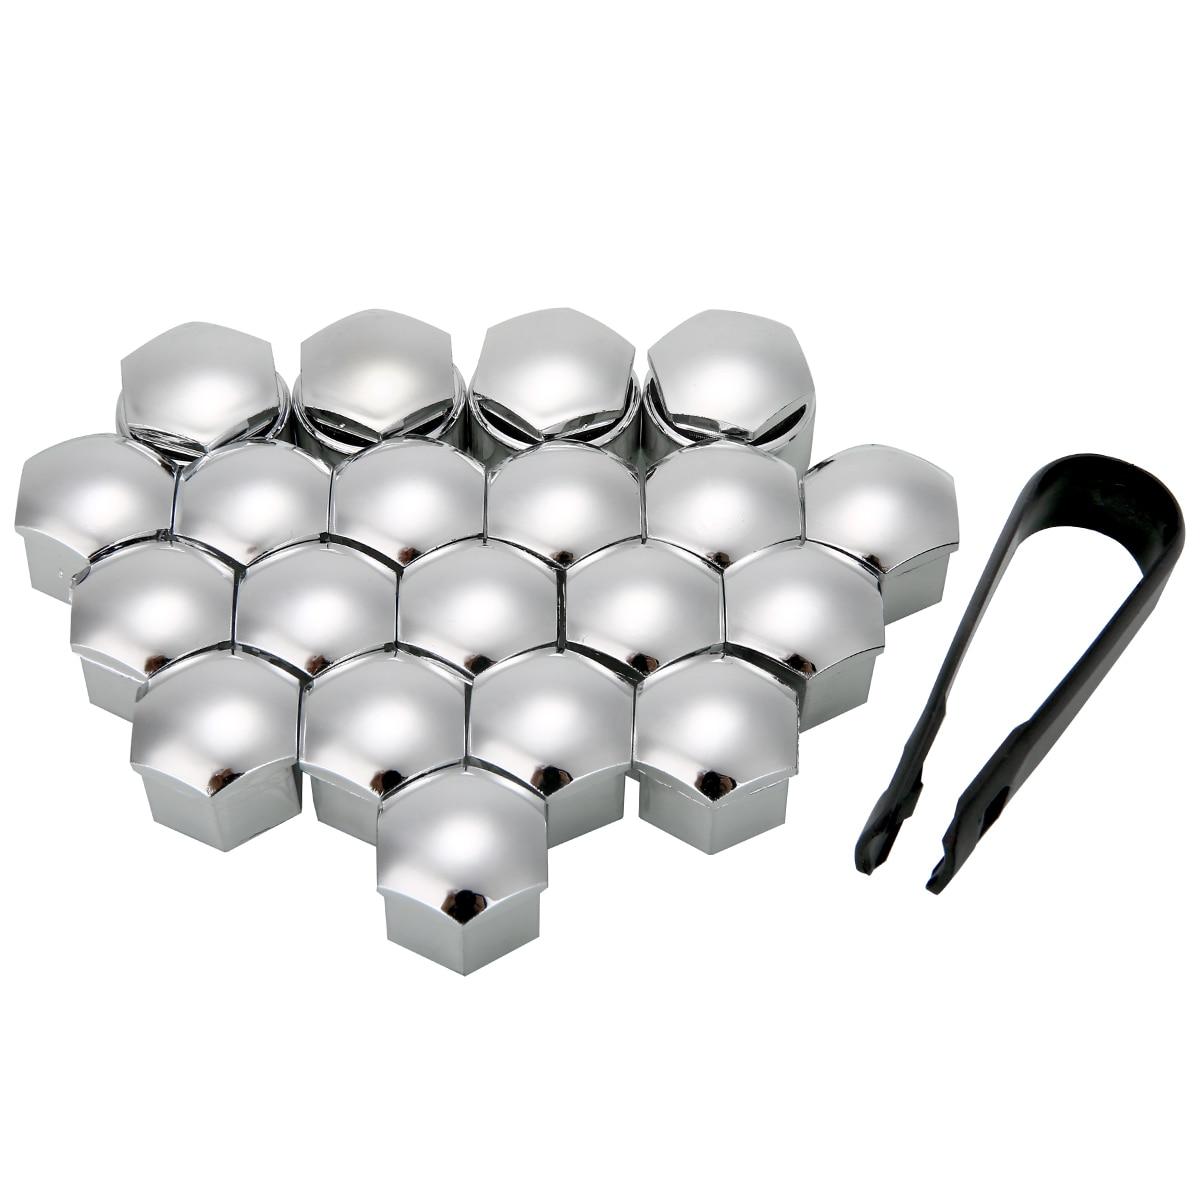 Chrome Silver DIYI 20 Pcs Car Wheel Bolt Nut Head Cap Covers 17mm Hexagonal Protectors